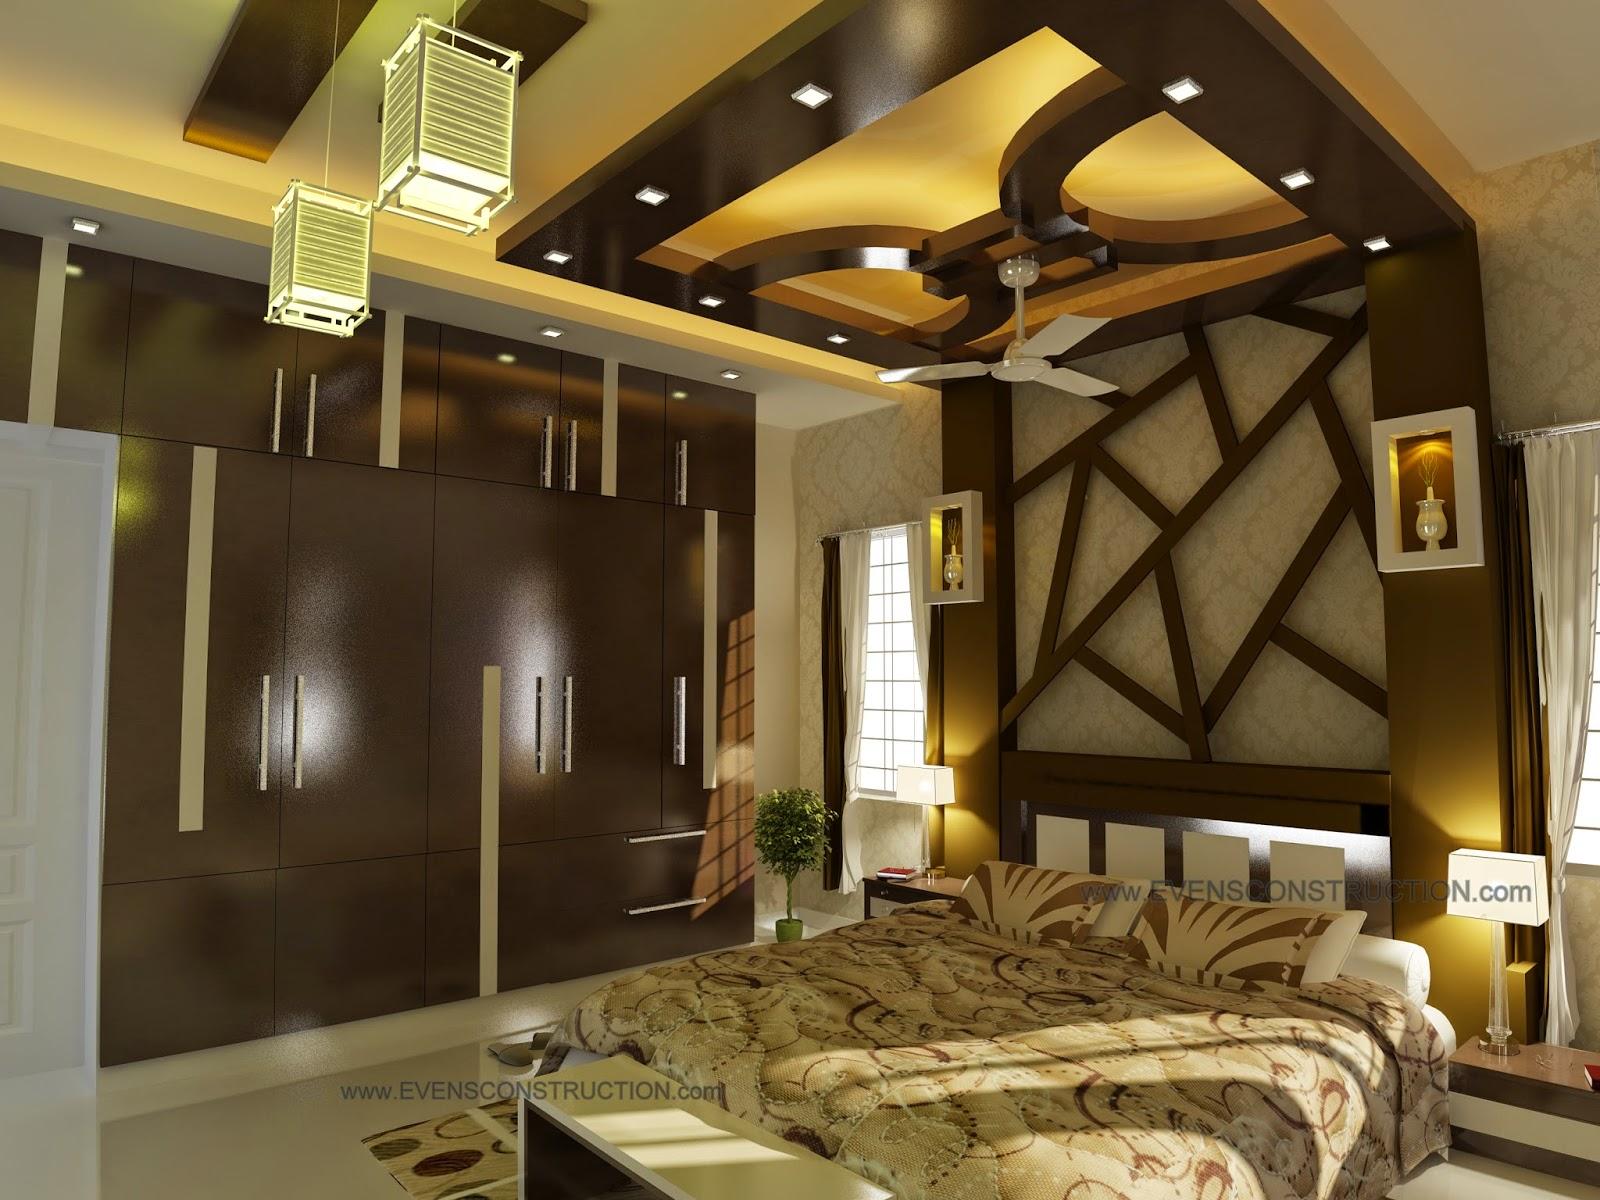 Evens construction pvt ltd april 2015 for Villa interior designers ltd nairobi kenya